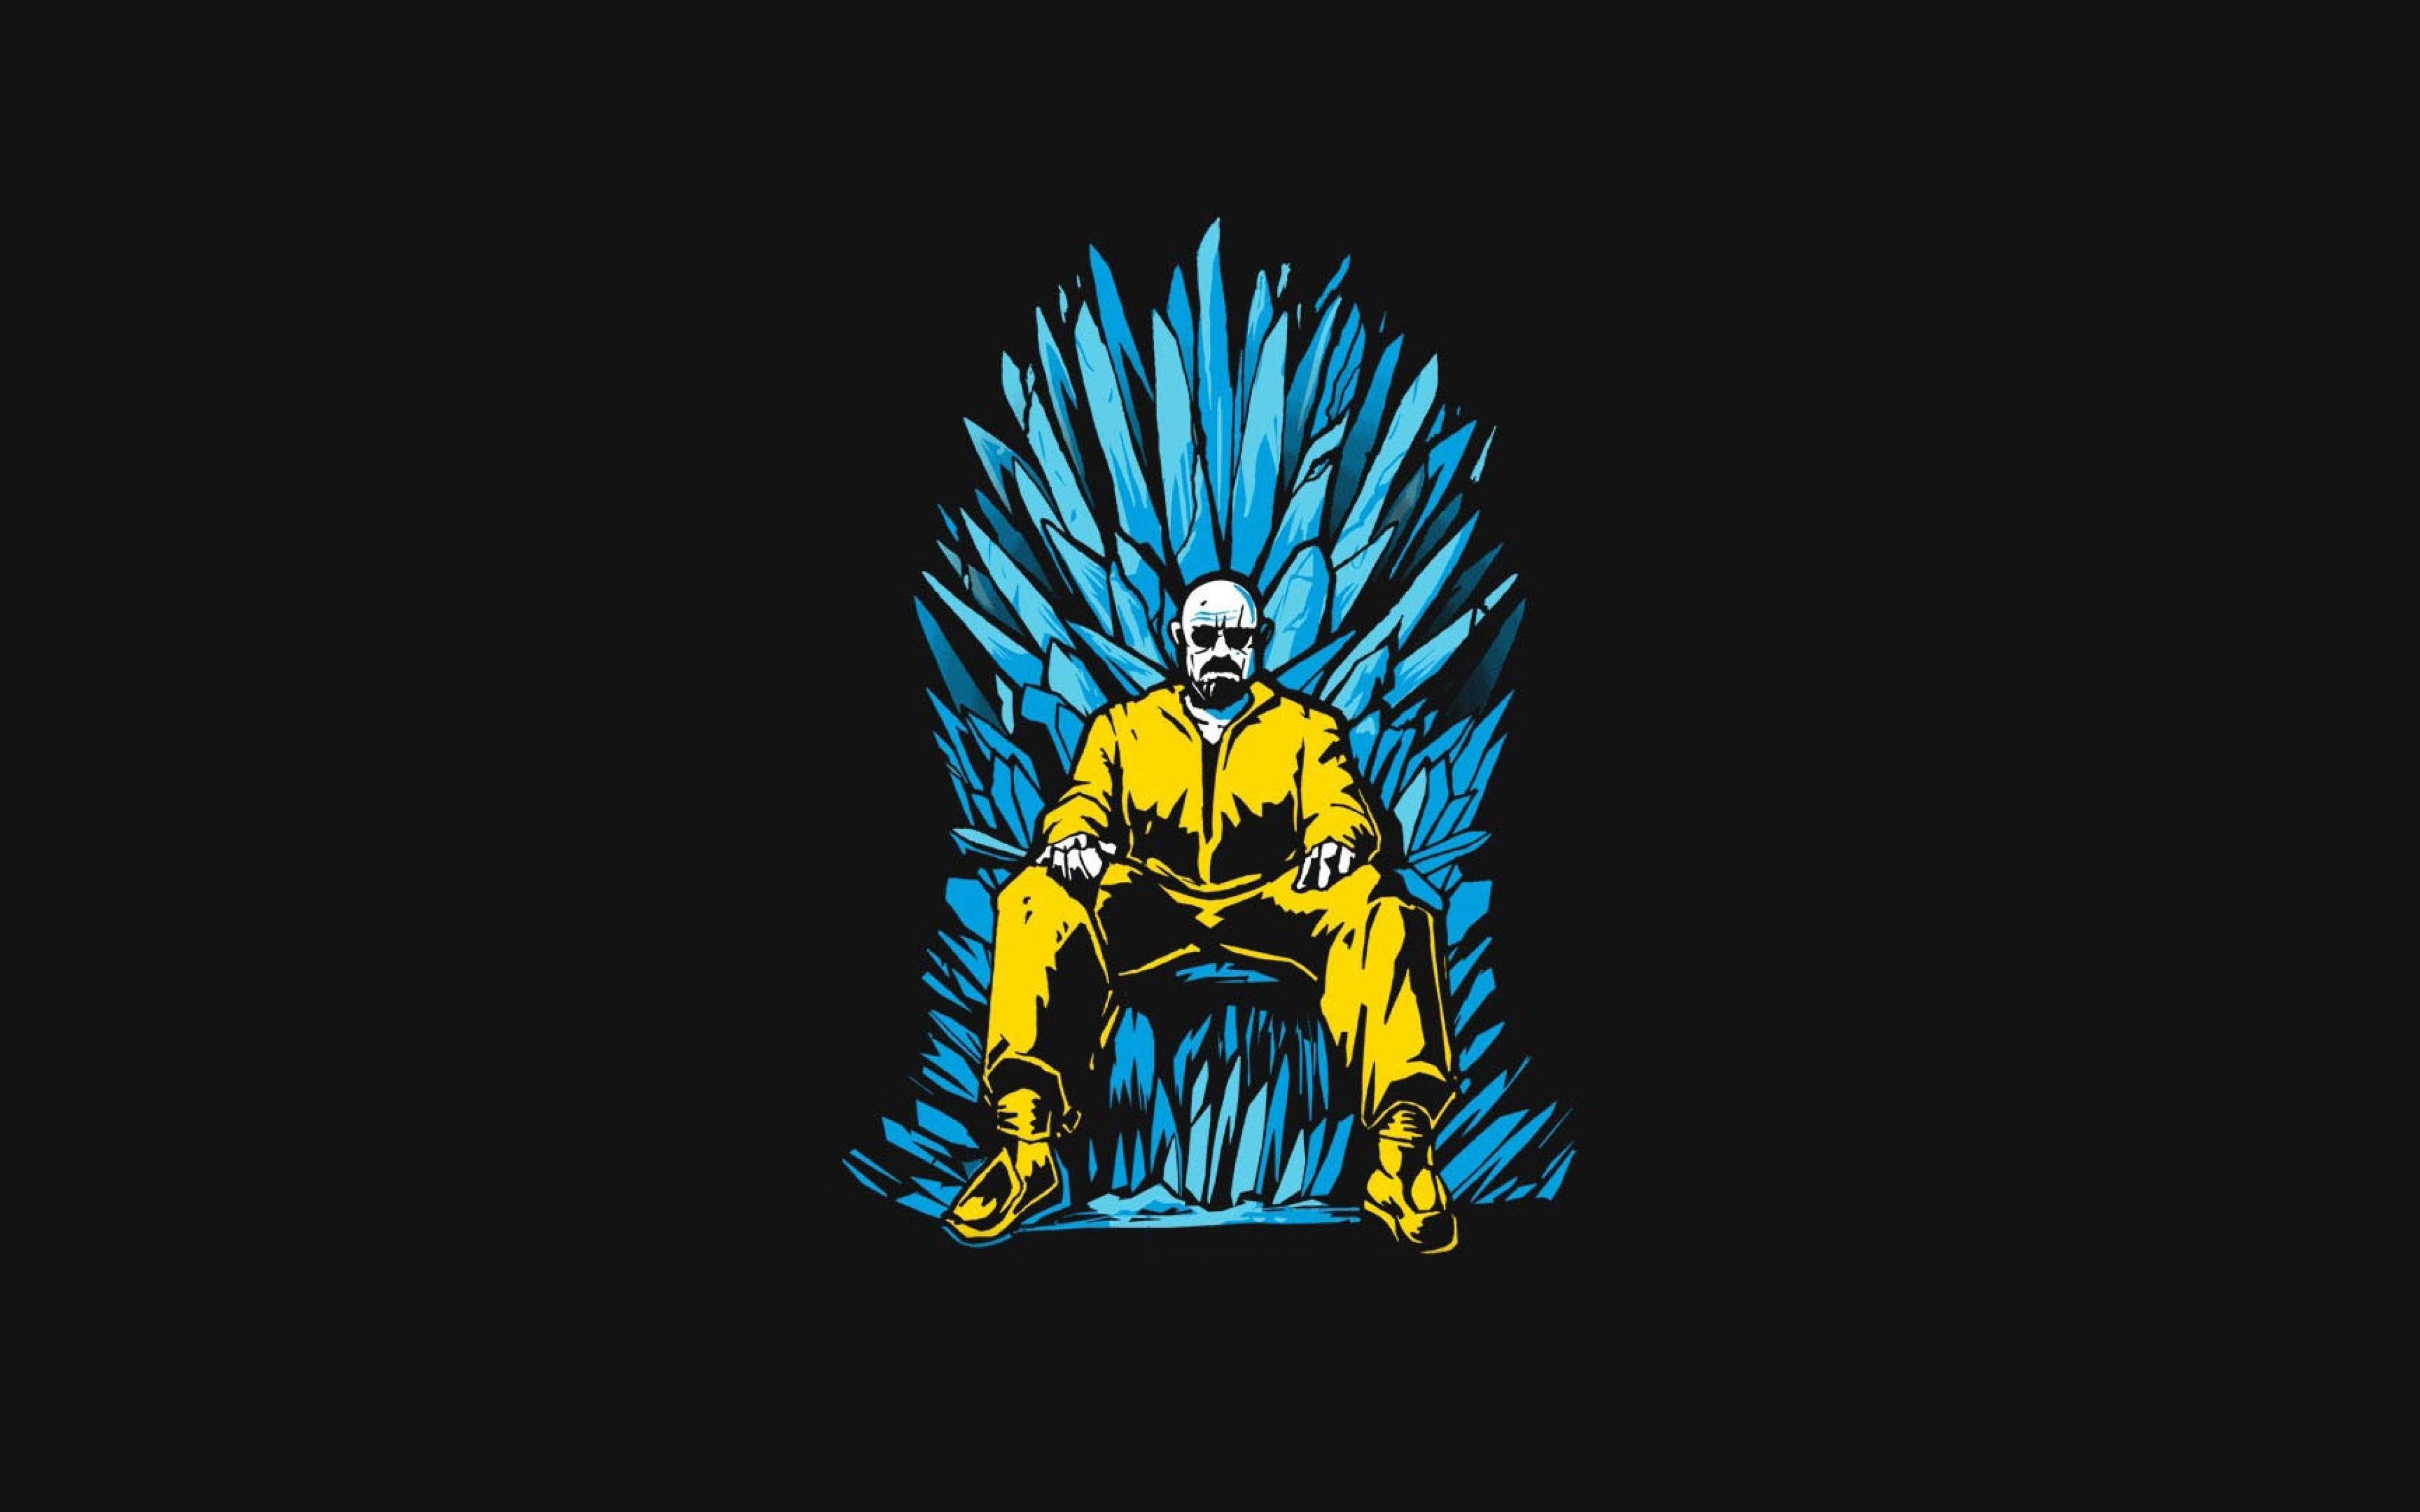 Download Walter White Game Of Thrones Minimalism 1080x1920